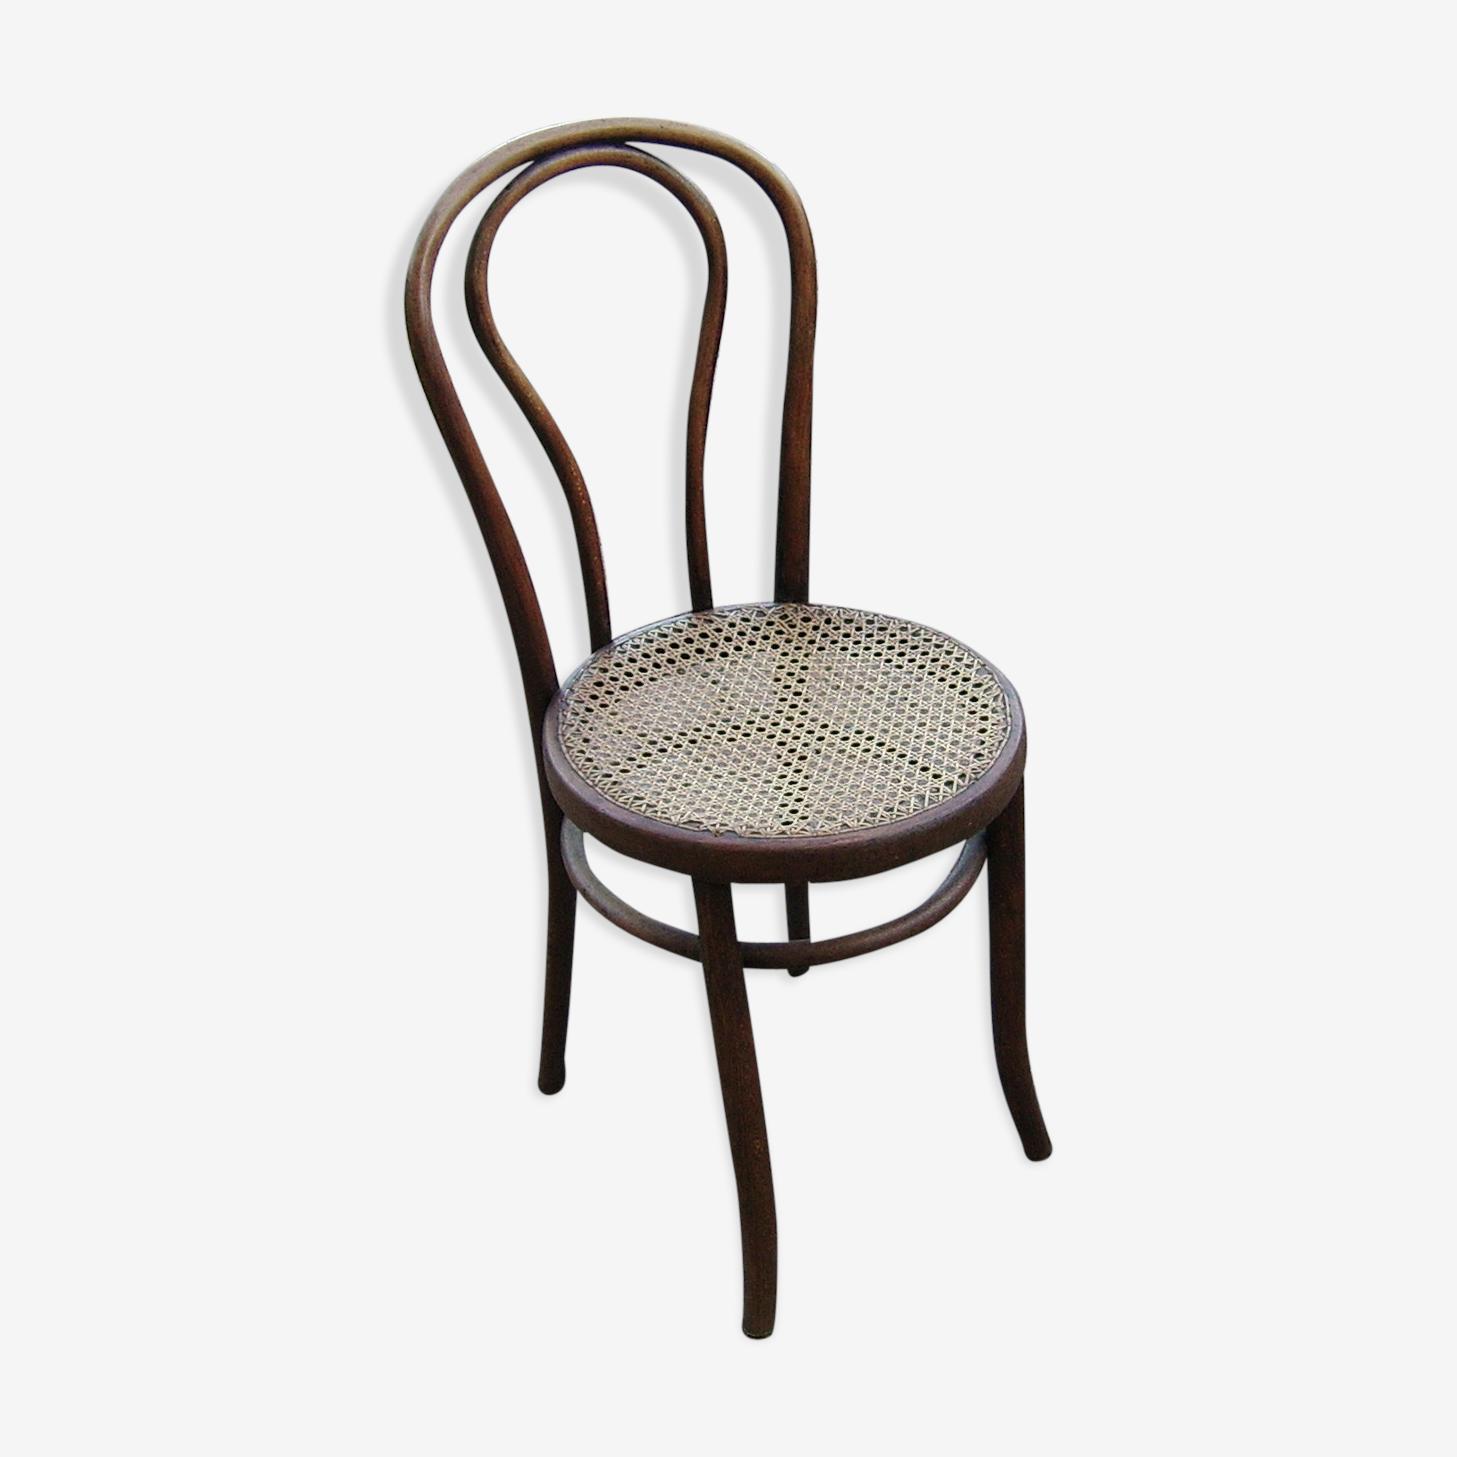 Chaise de bistrot en bois Fischel